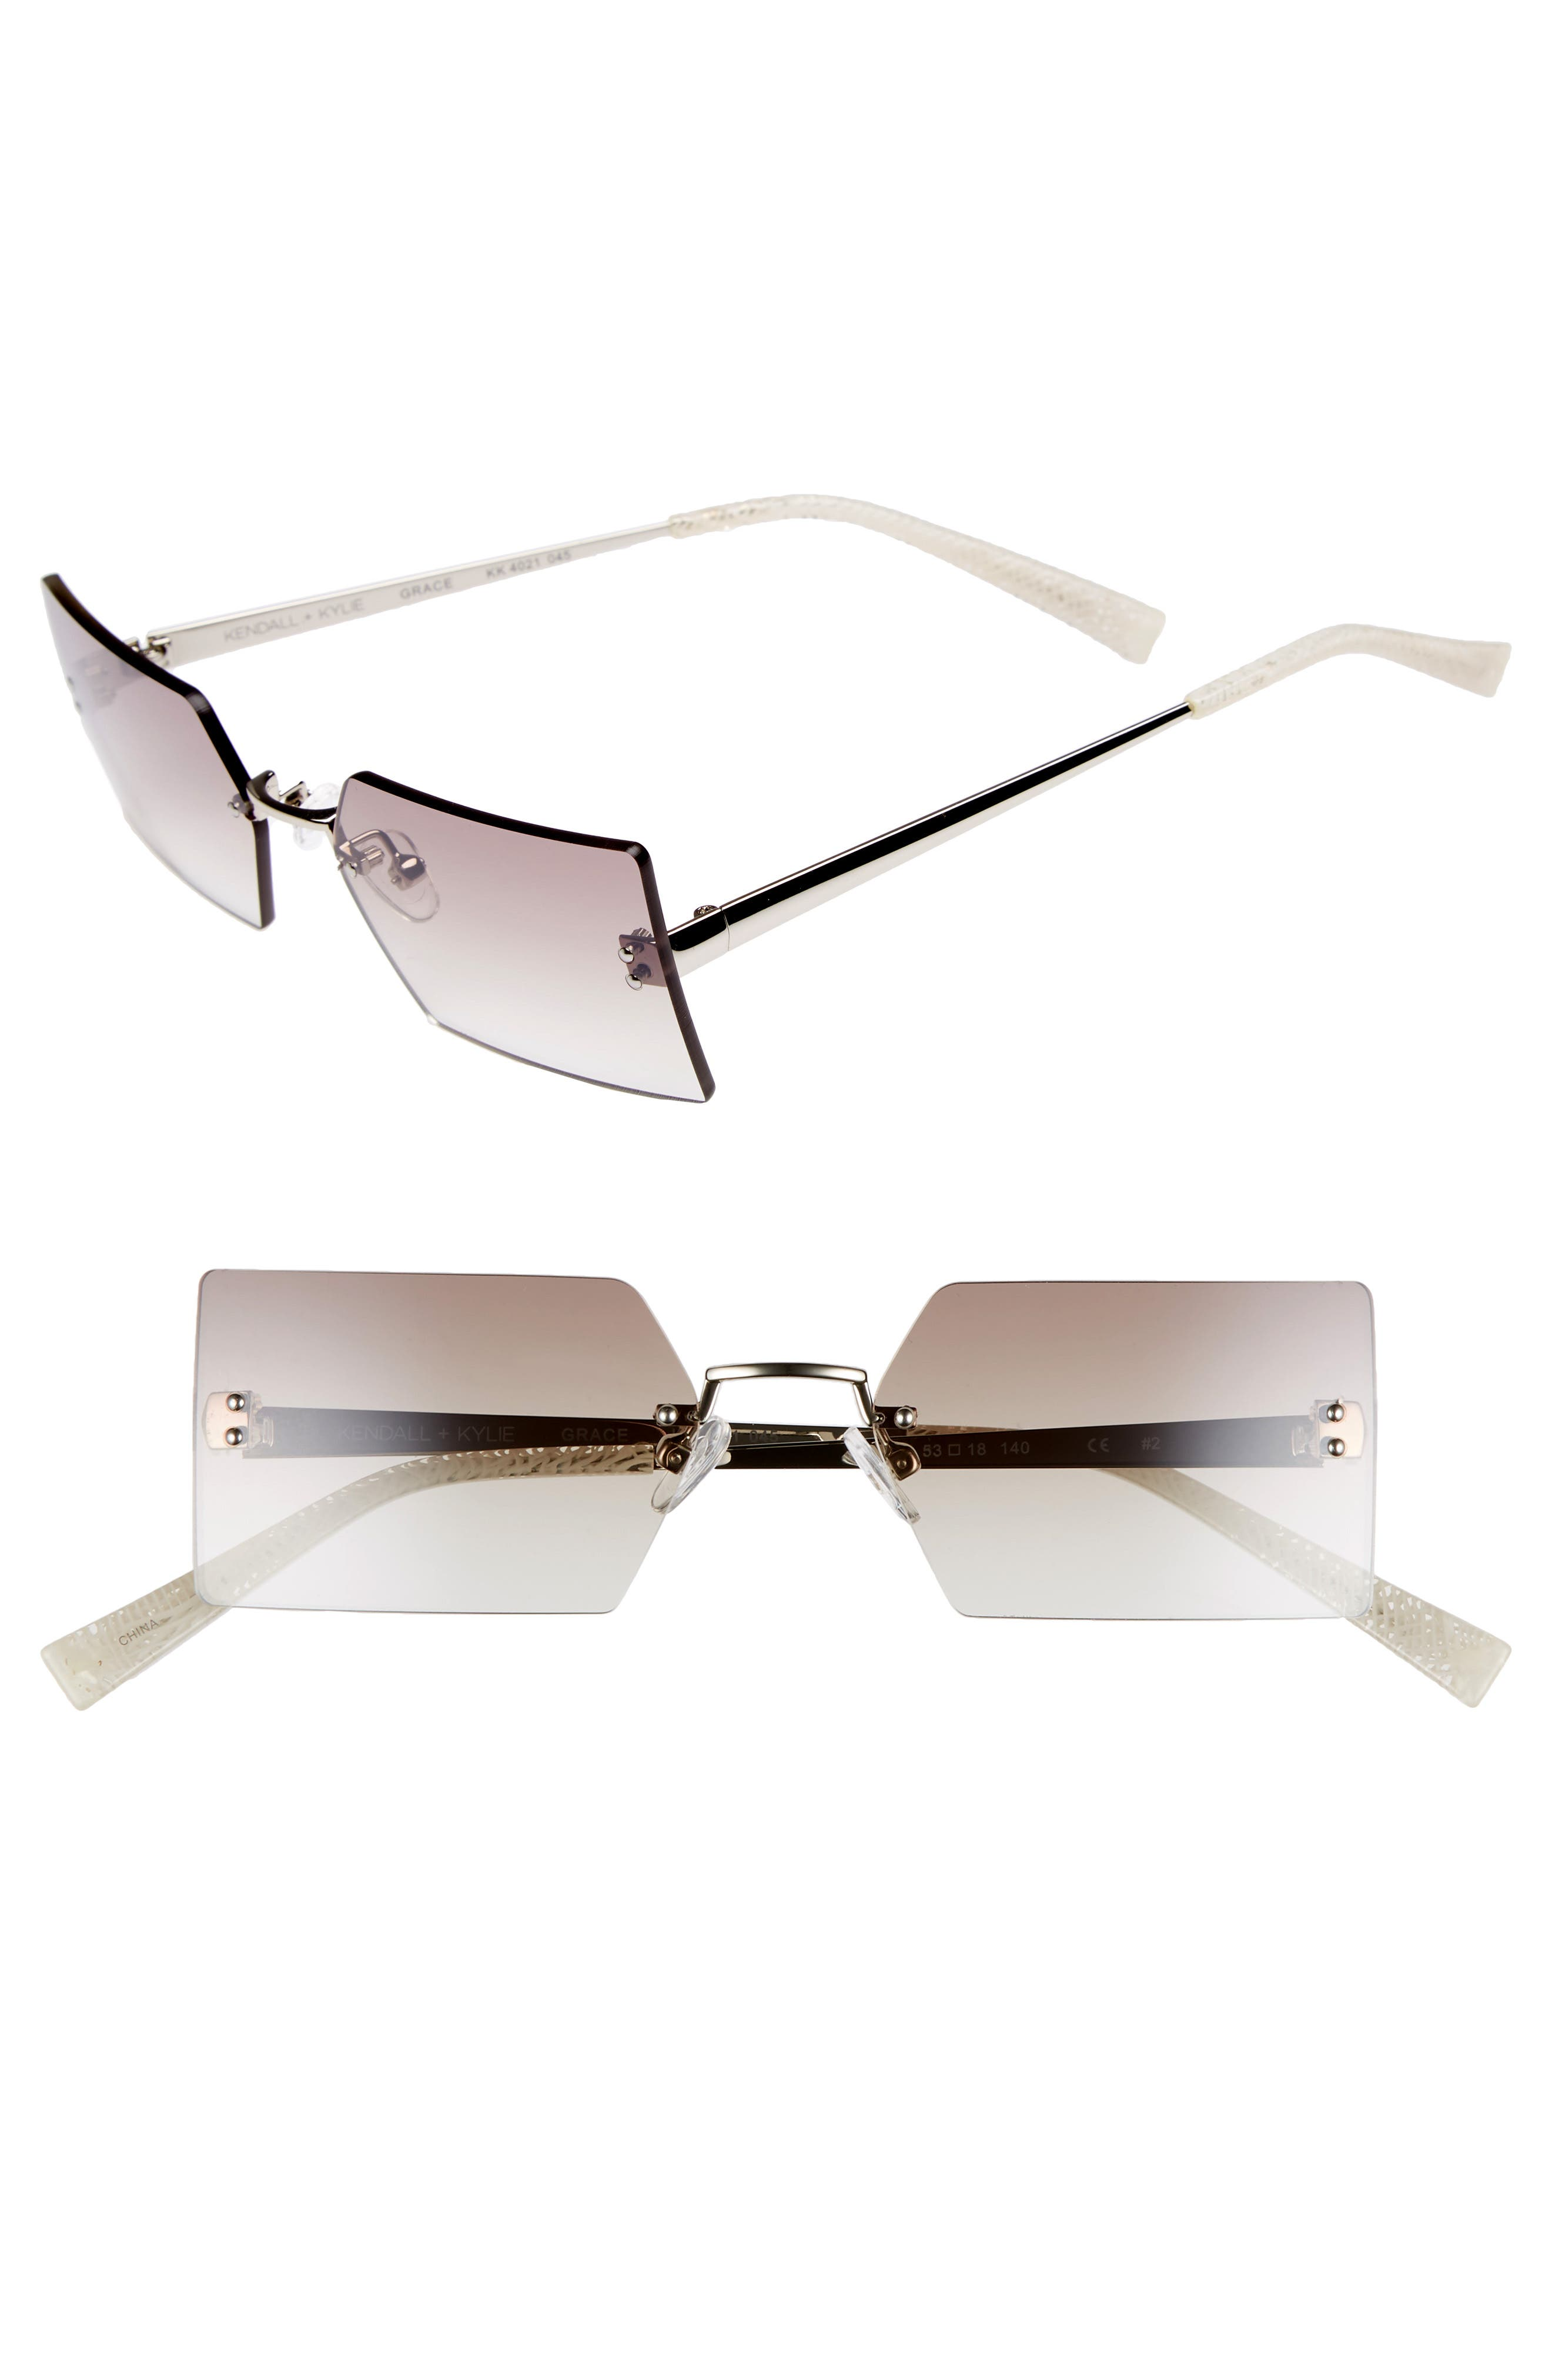 Grace 53mm Rimless Rectangular Sunglasses,                             Main thumbnail 1, color,                             SILVER/ BROWN/ CLEAR GRADIENT